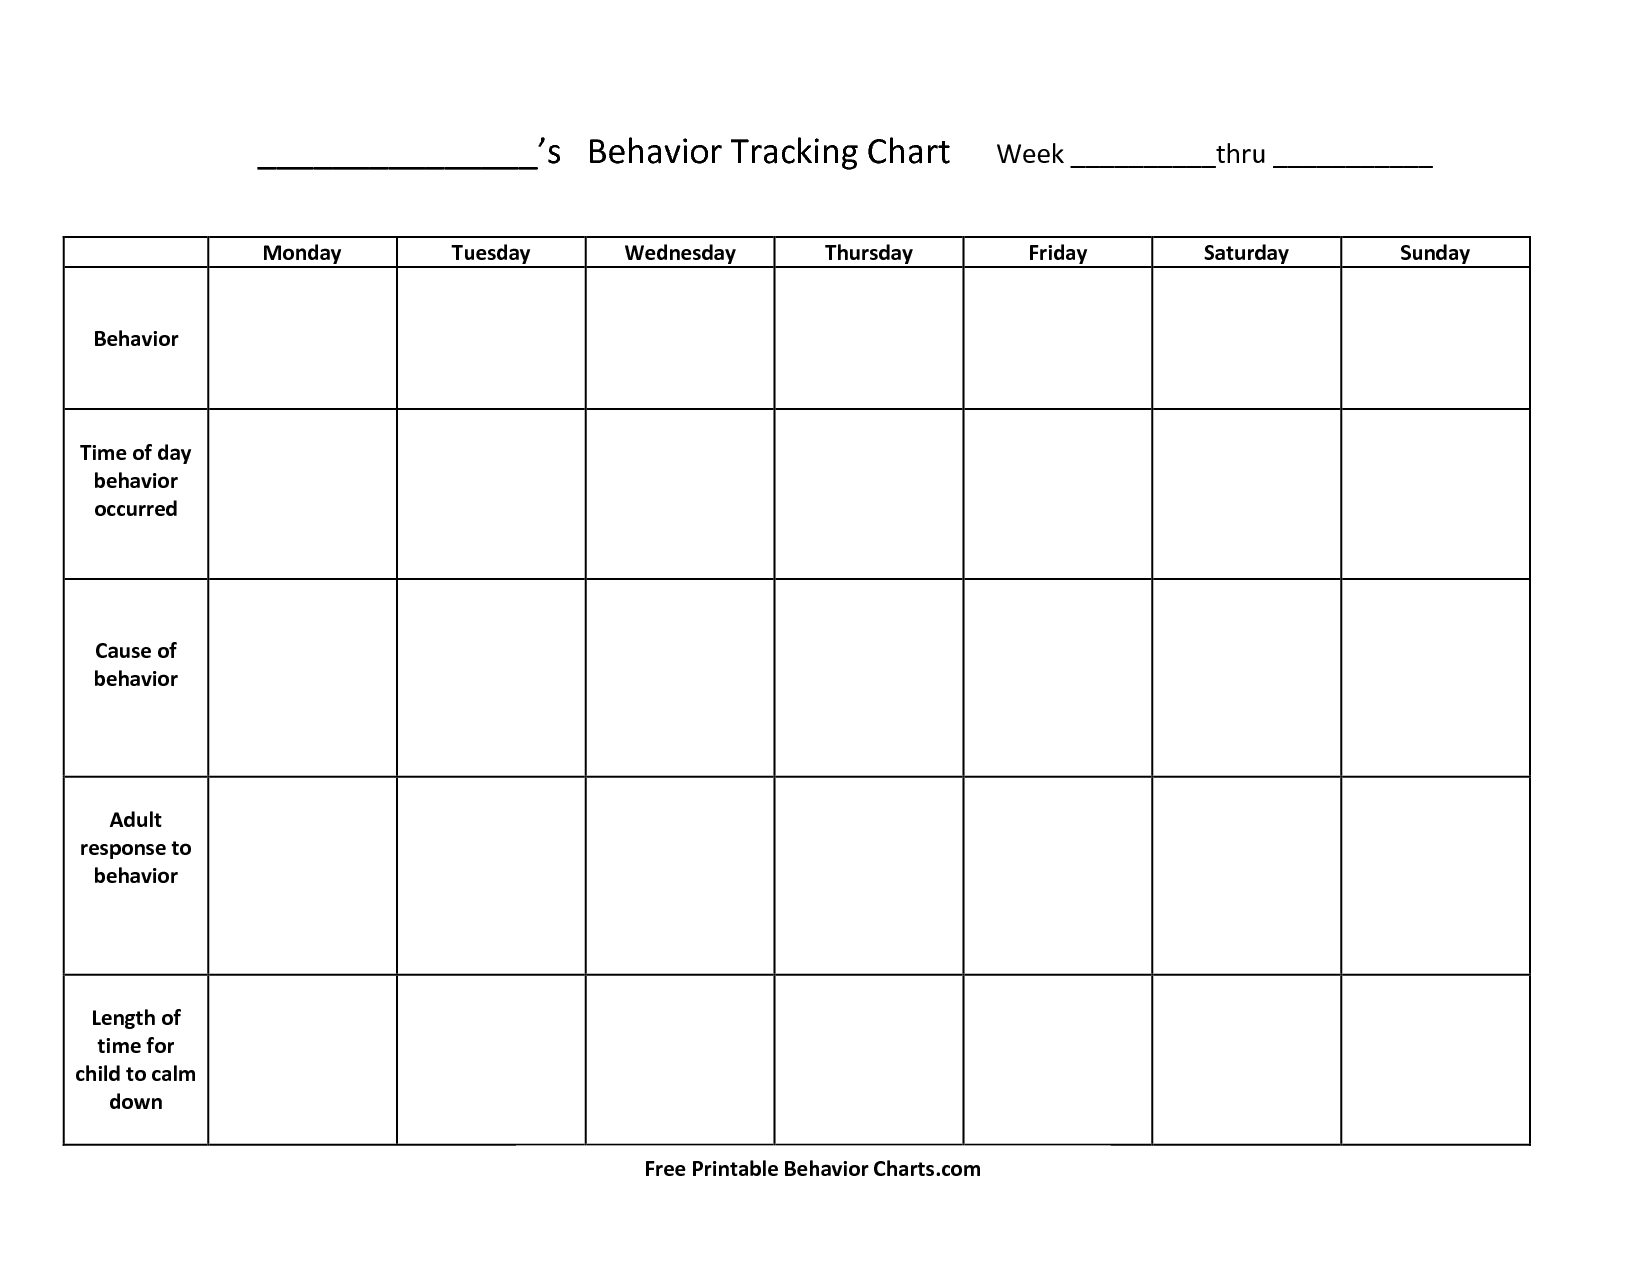 Free+Printable+Behavior+Charts+For+Teachers   Things To Try   Free - Free Printable Charts For Teachers